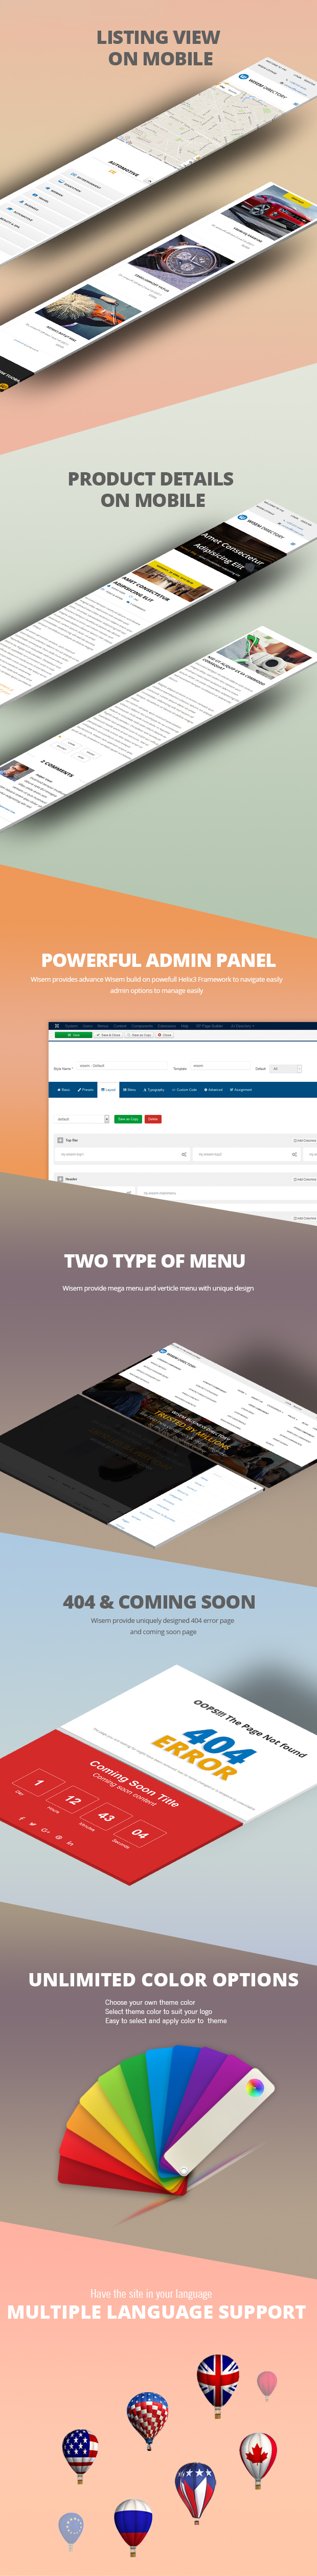 Joomla template for directory